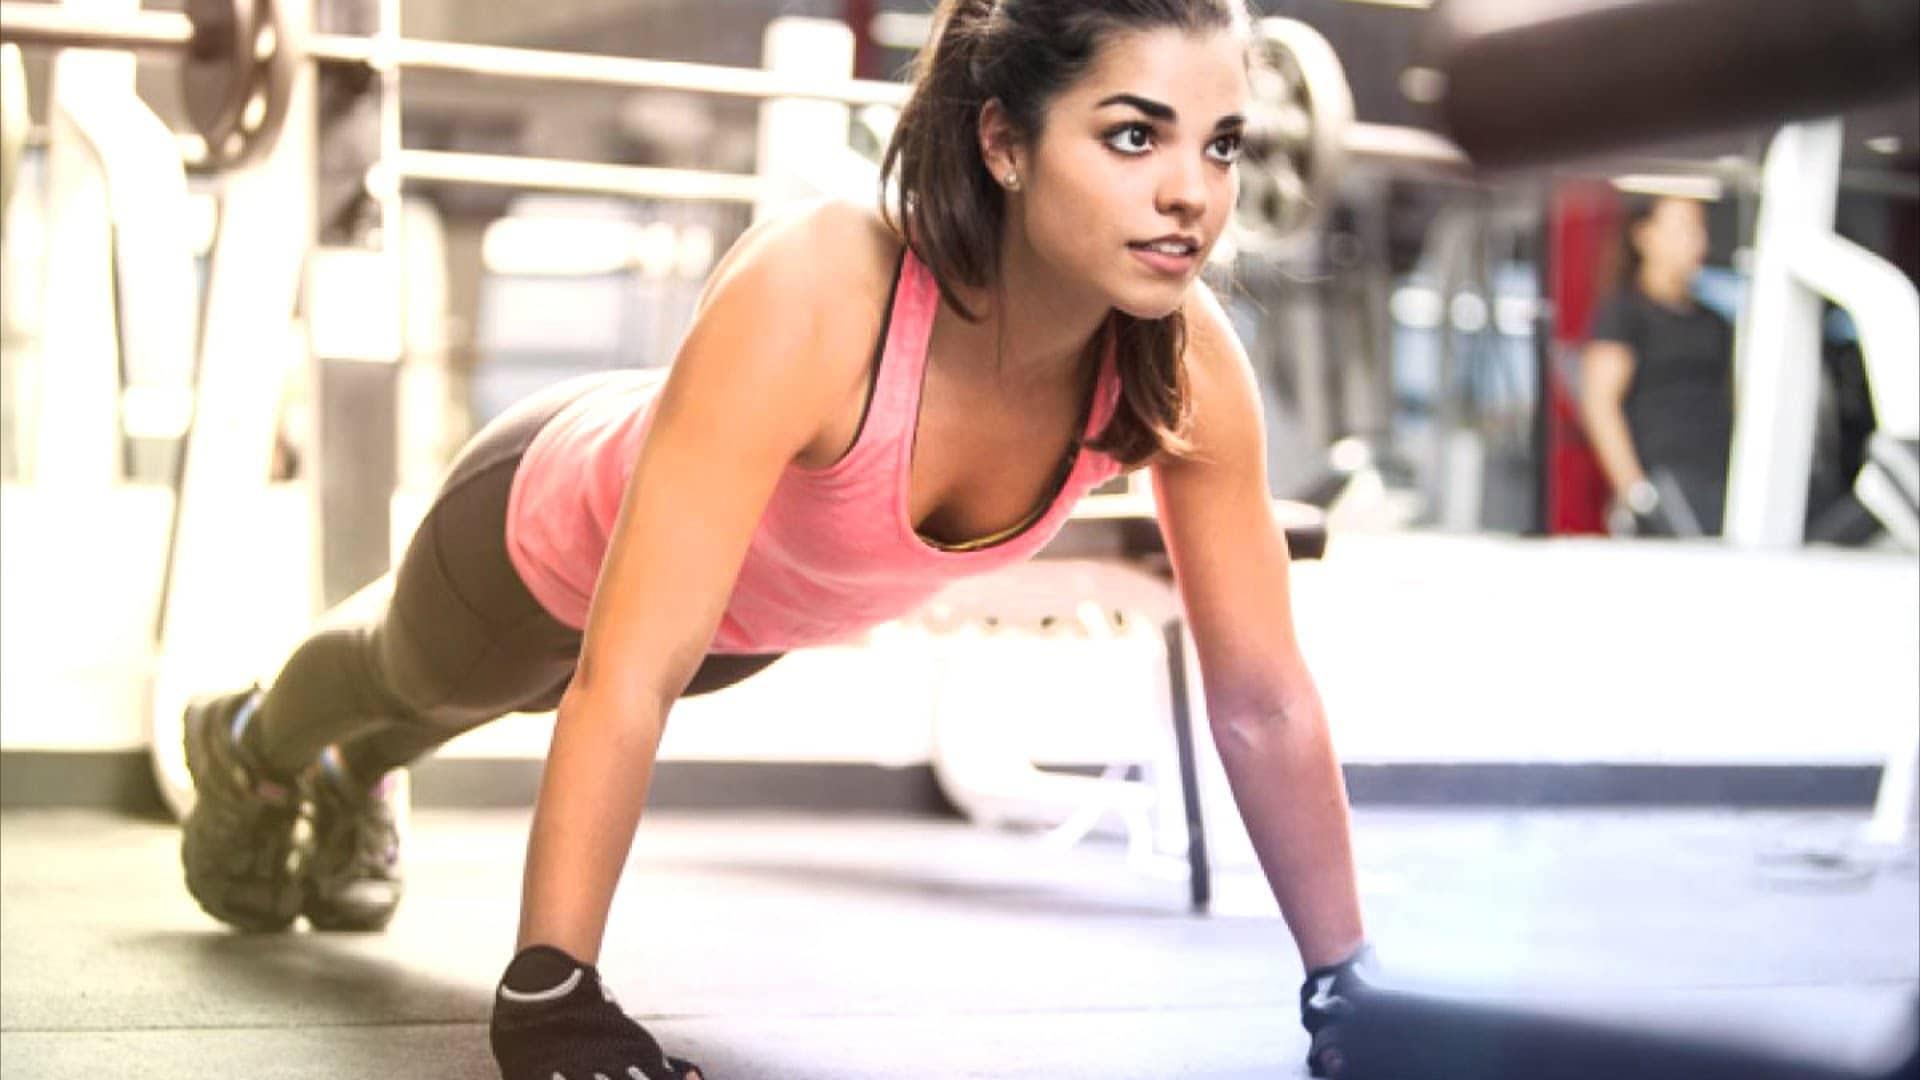 Female bodybuilding motivation video fitnessrezepte de